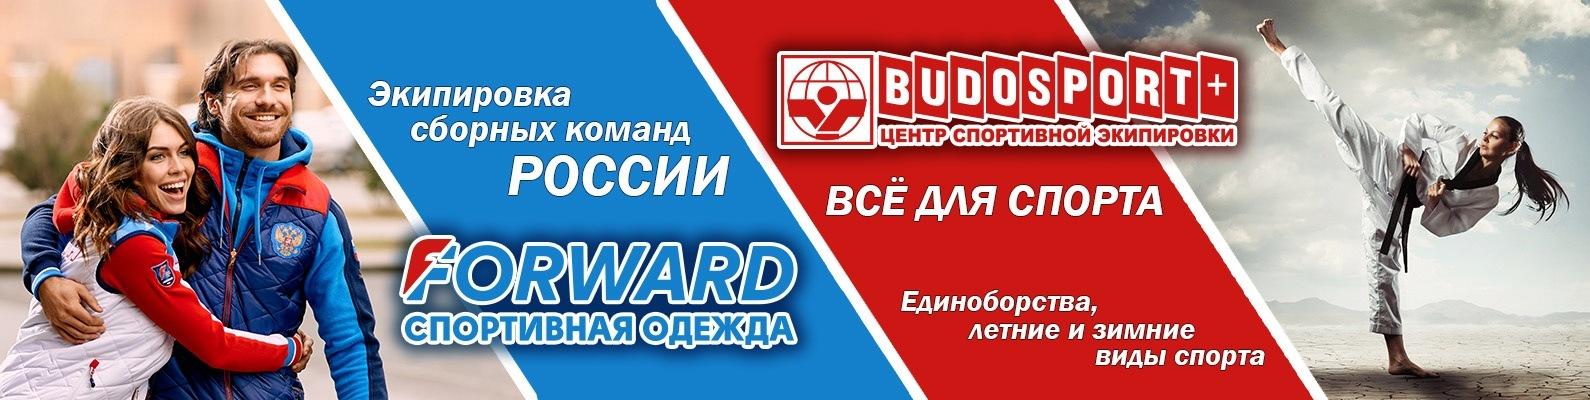 BUDOSPORT + Forward Спортивная одежда Красноярск   ВКонтакте c4d0a5ba4ae